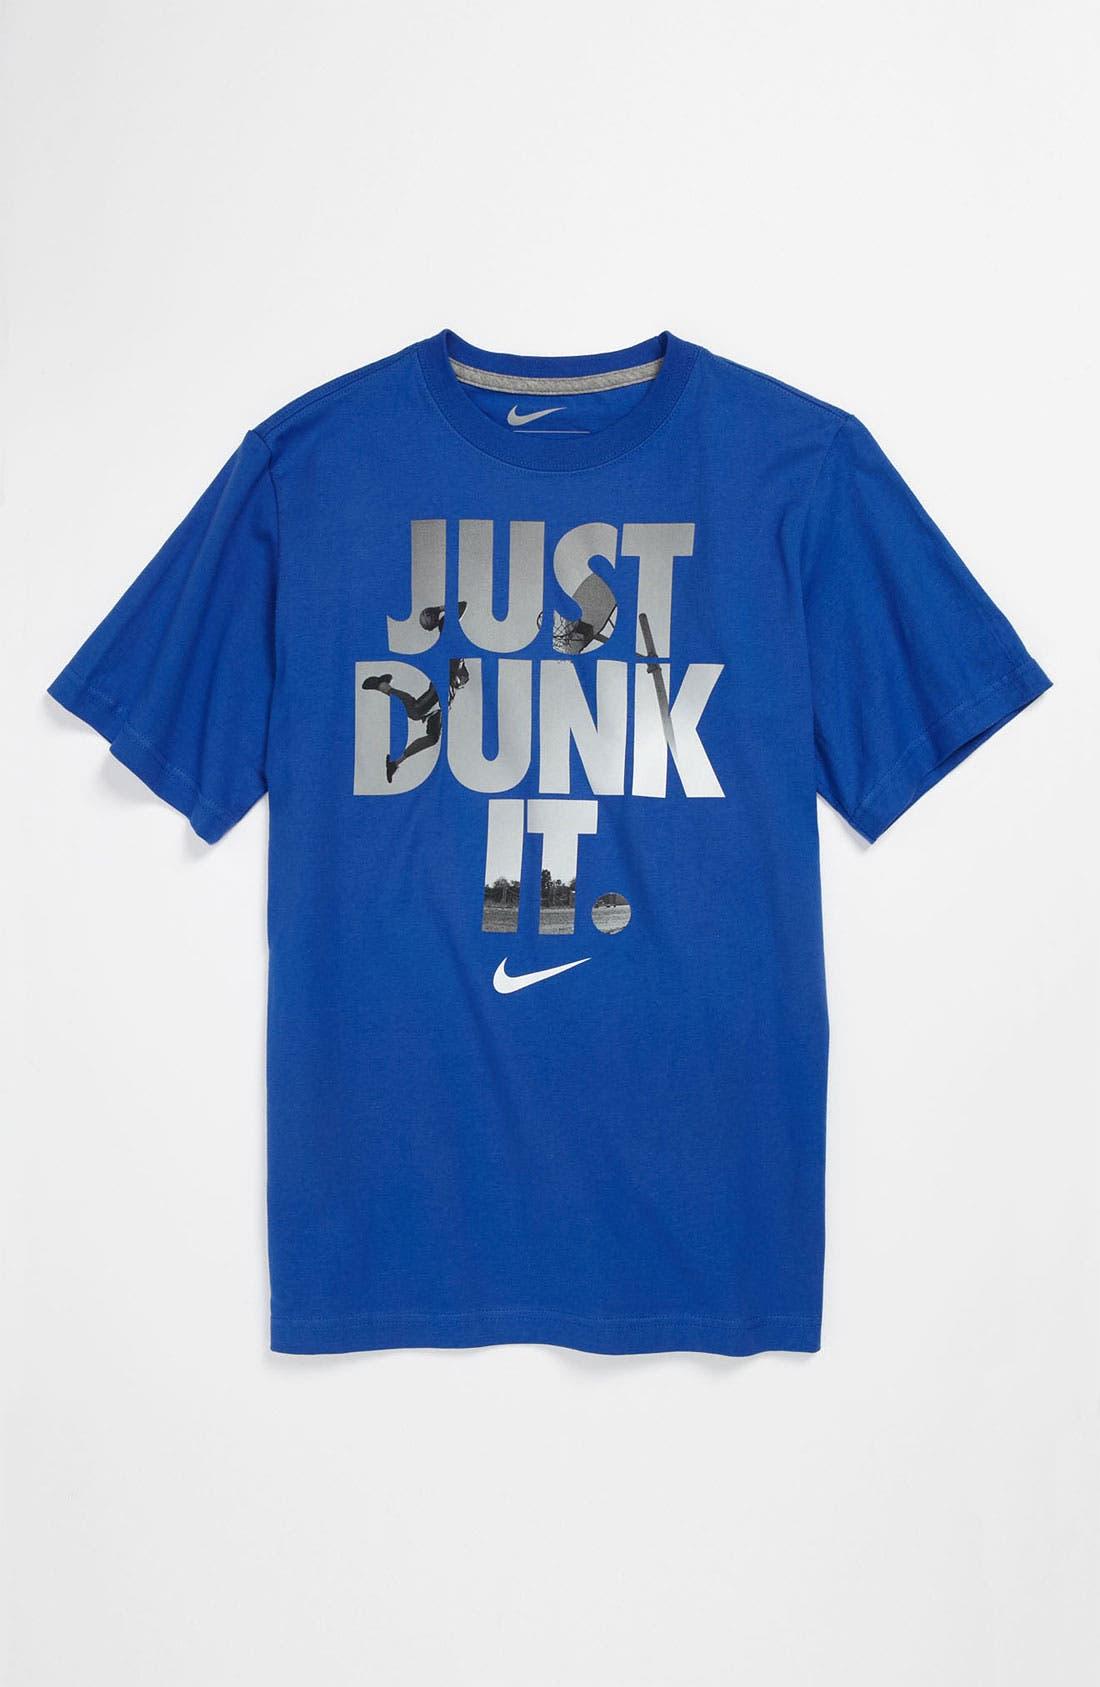 Nike Just Dunk It Men's Tee